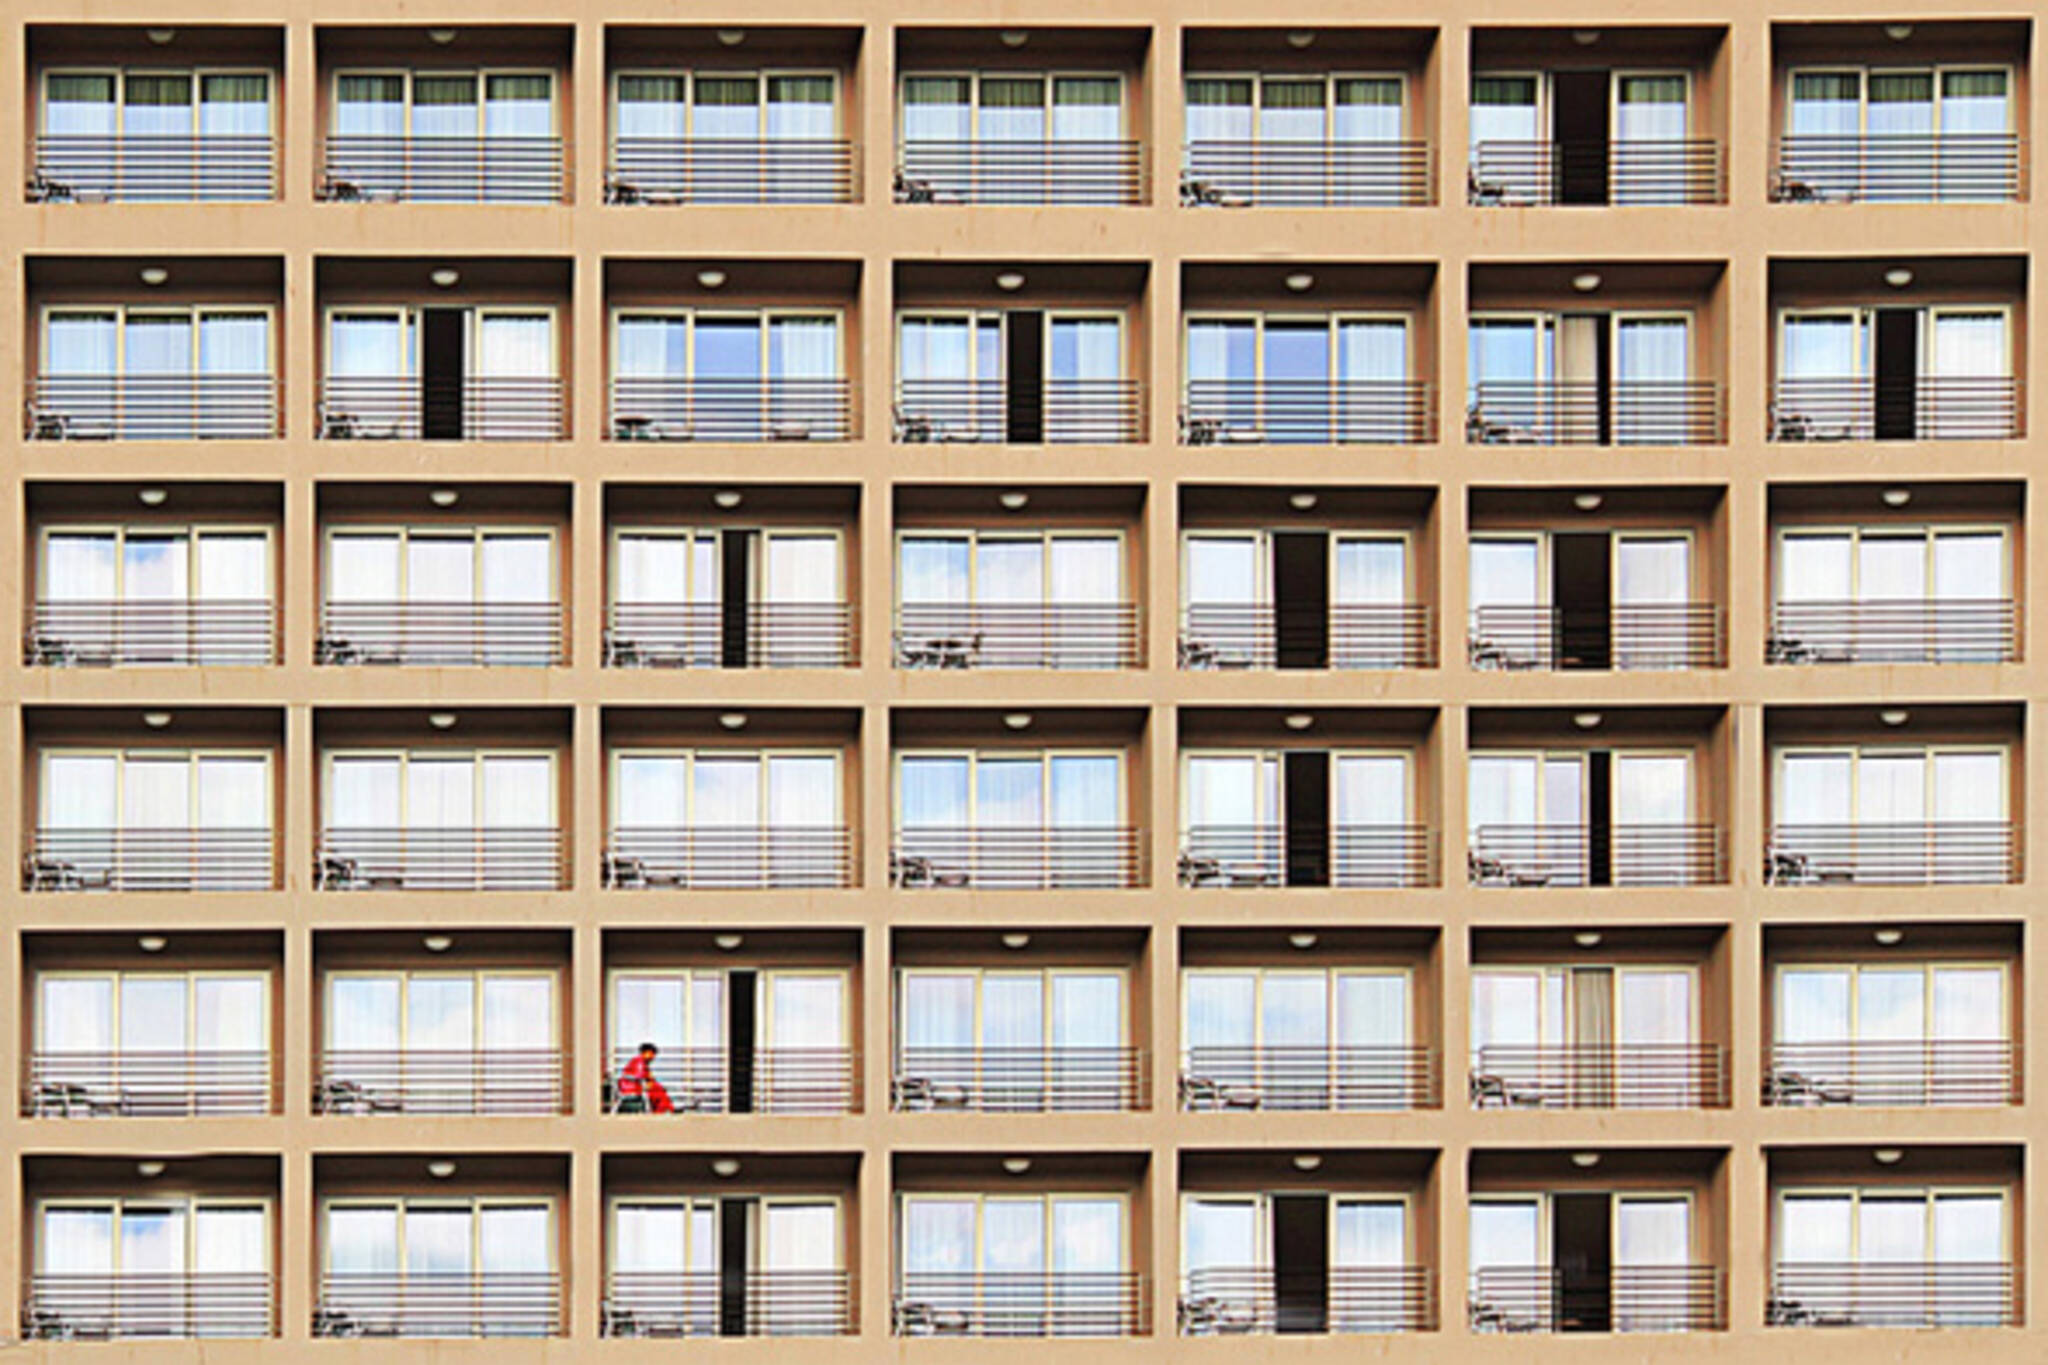 Toronto apartment building